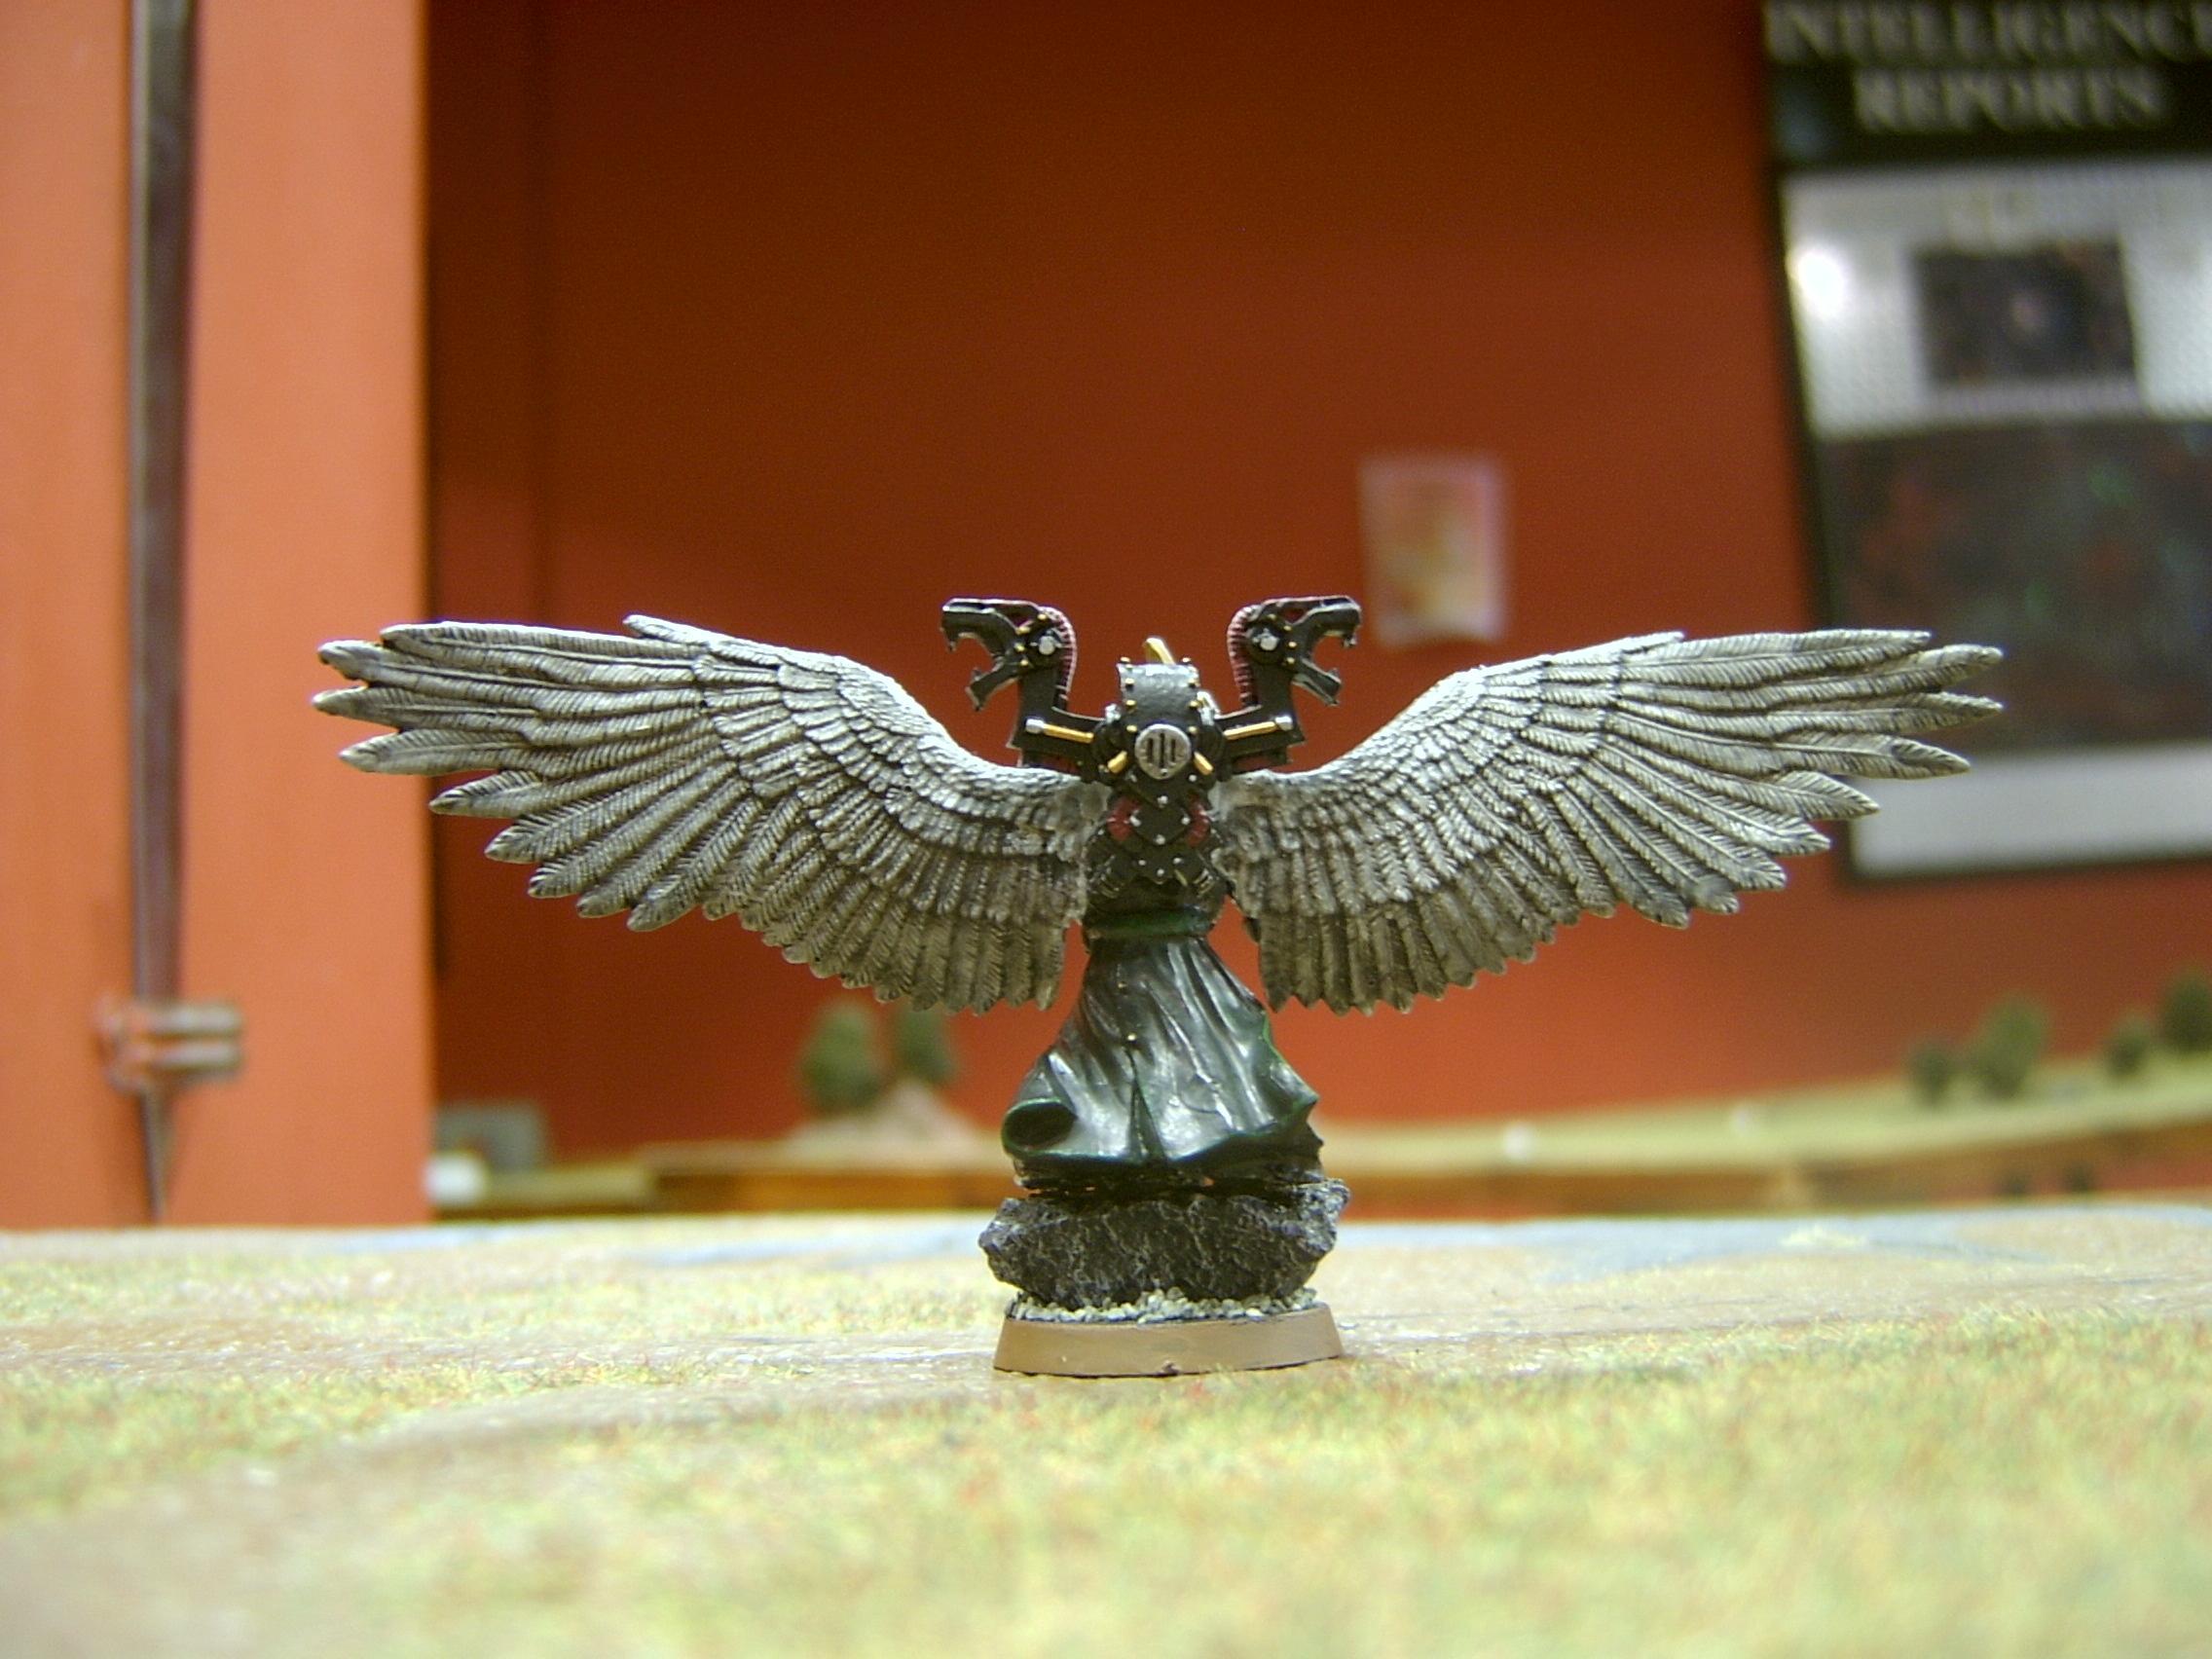 Chaos Space Marines, Dark Angels, Fallen Angel, Sorcerer, The Fallen, Warhammer 40,000